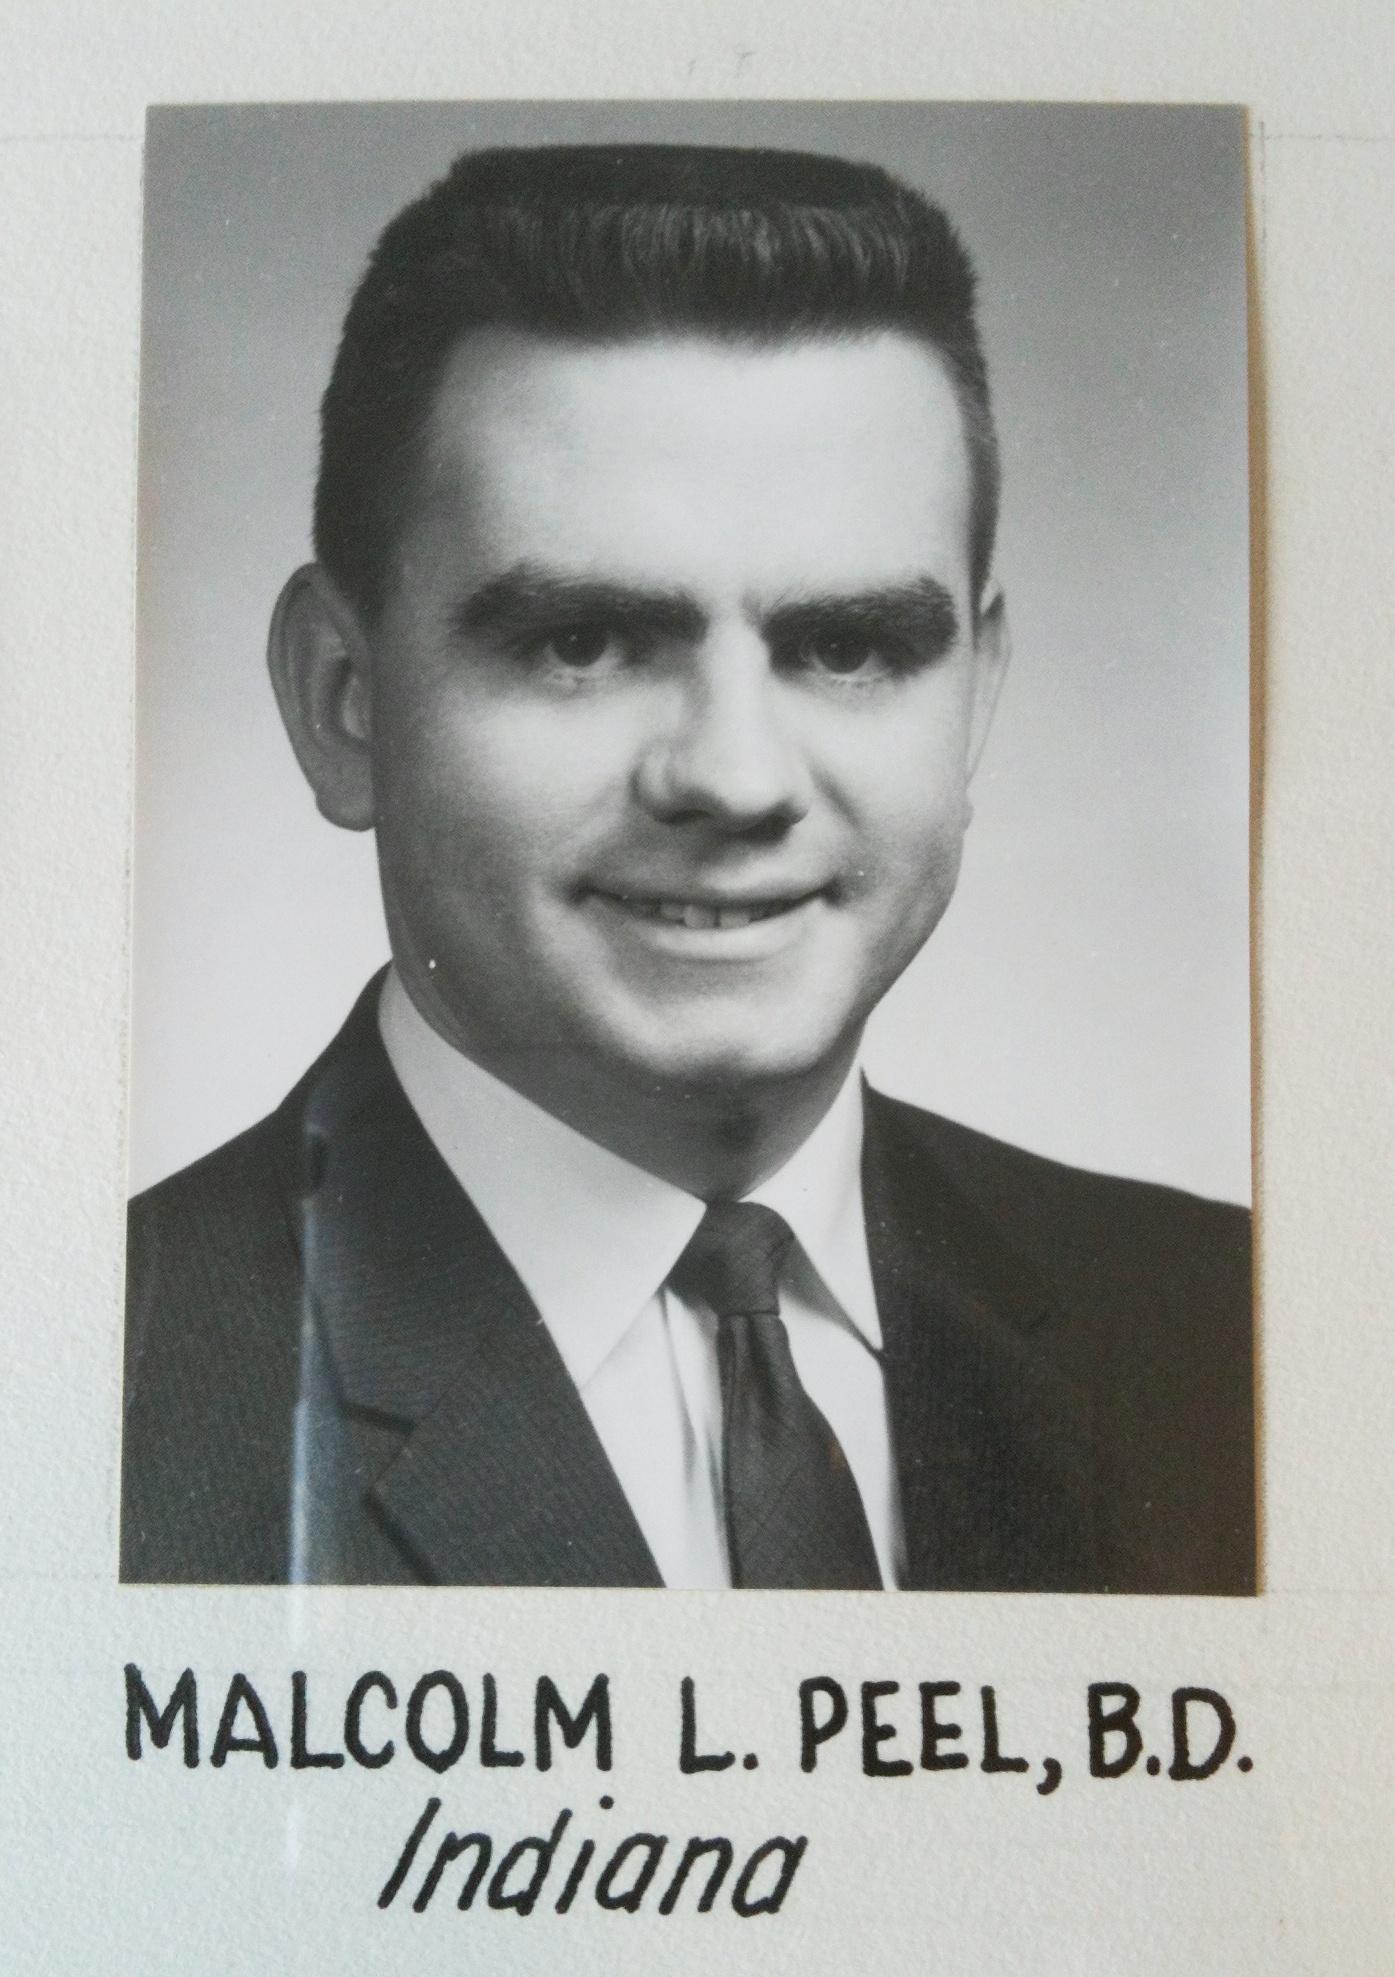 Malcolm Lee Peel